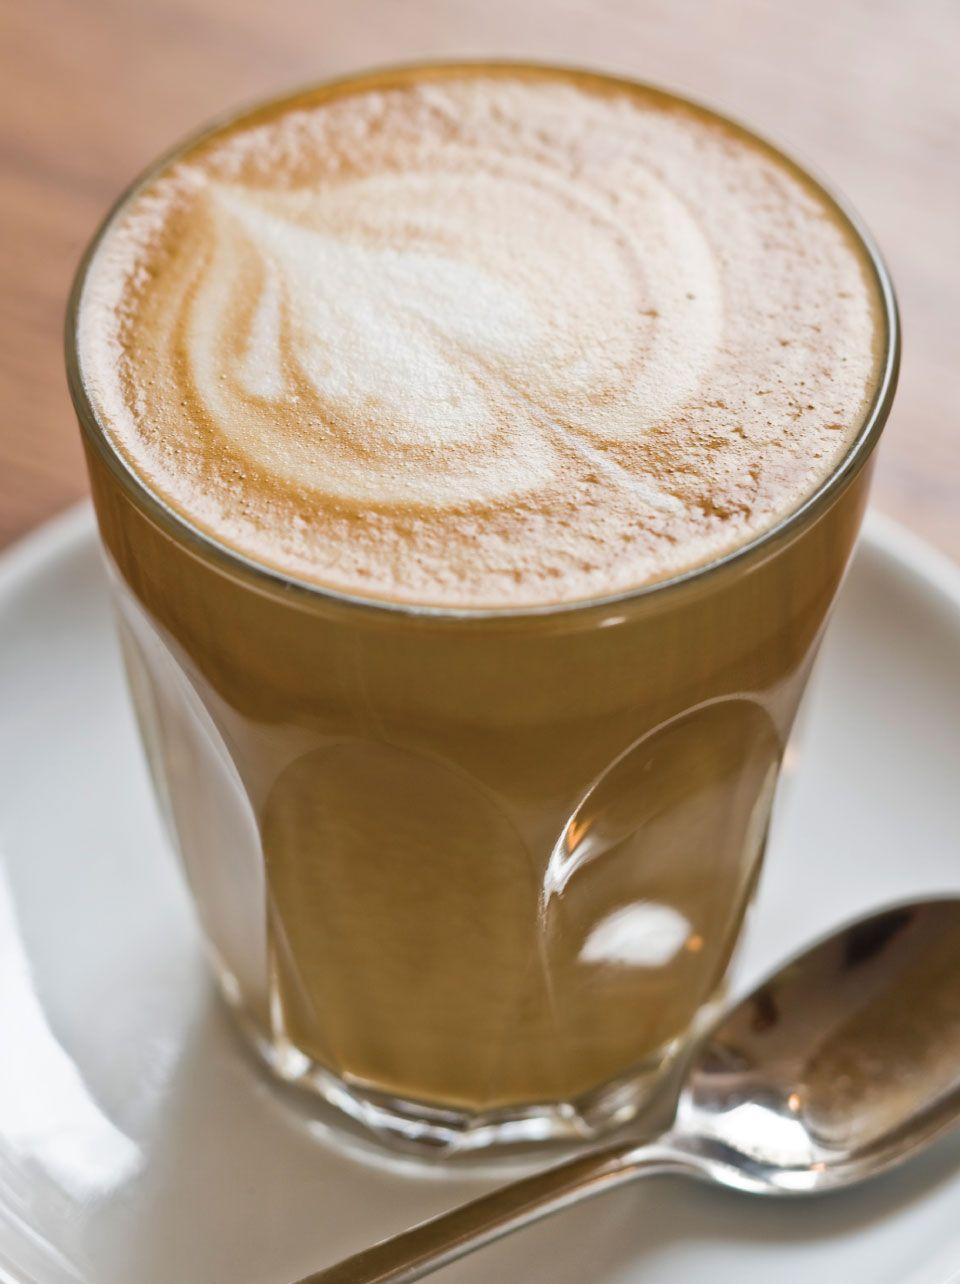 Urban Angel - Edinburgh Cafes & Restaurants - has good breakfast and smoothies too!